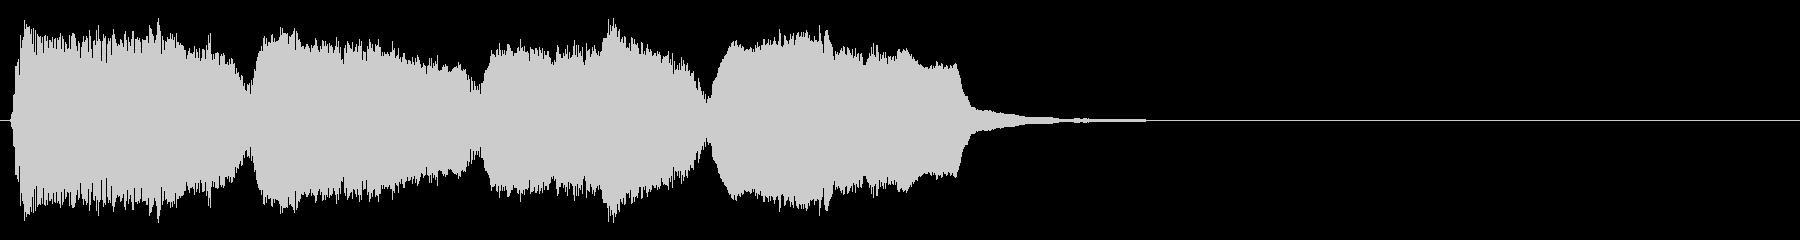 KANT勢いのある可愛いアイキャッチの未再生の波形